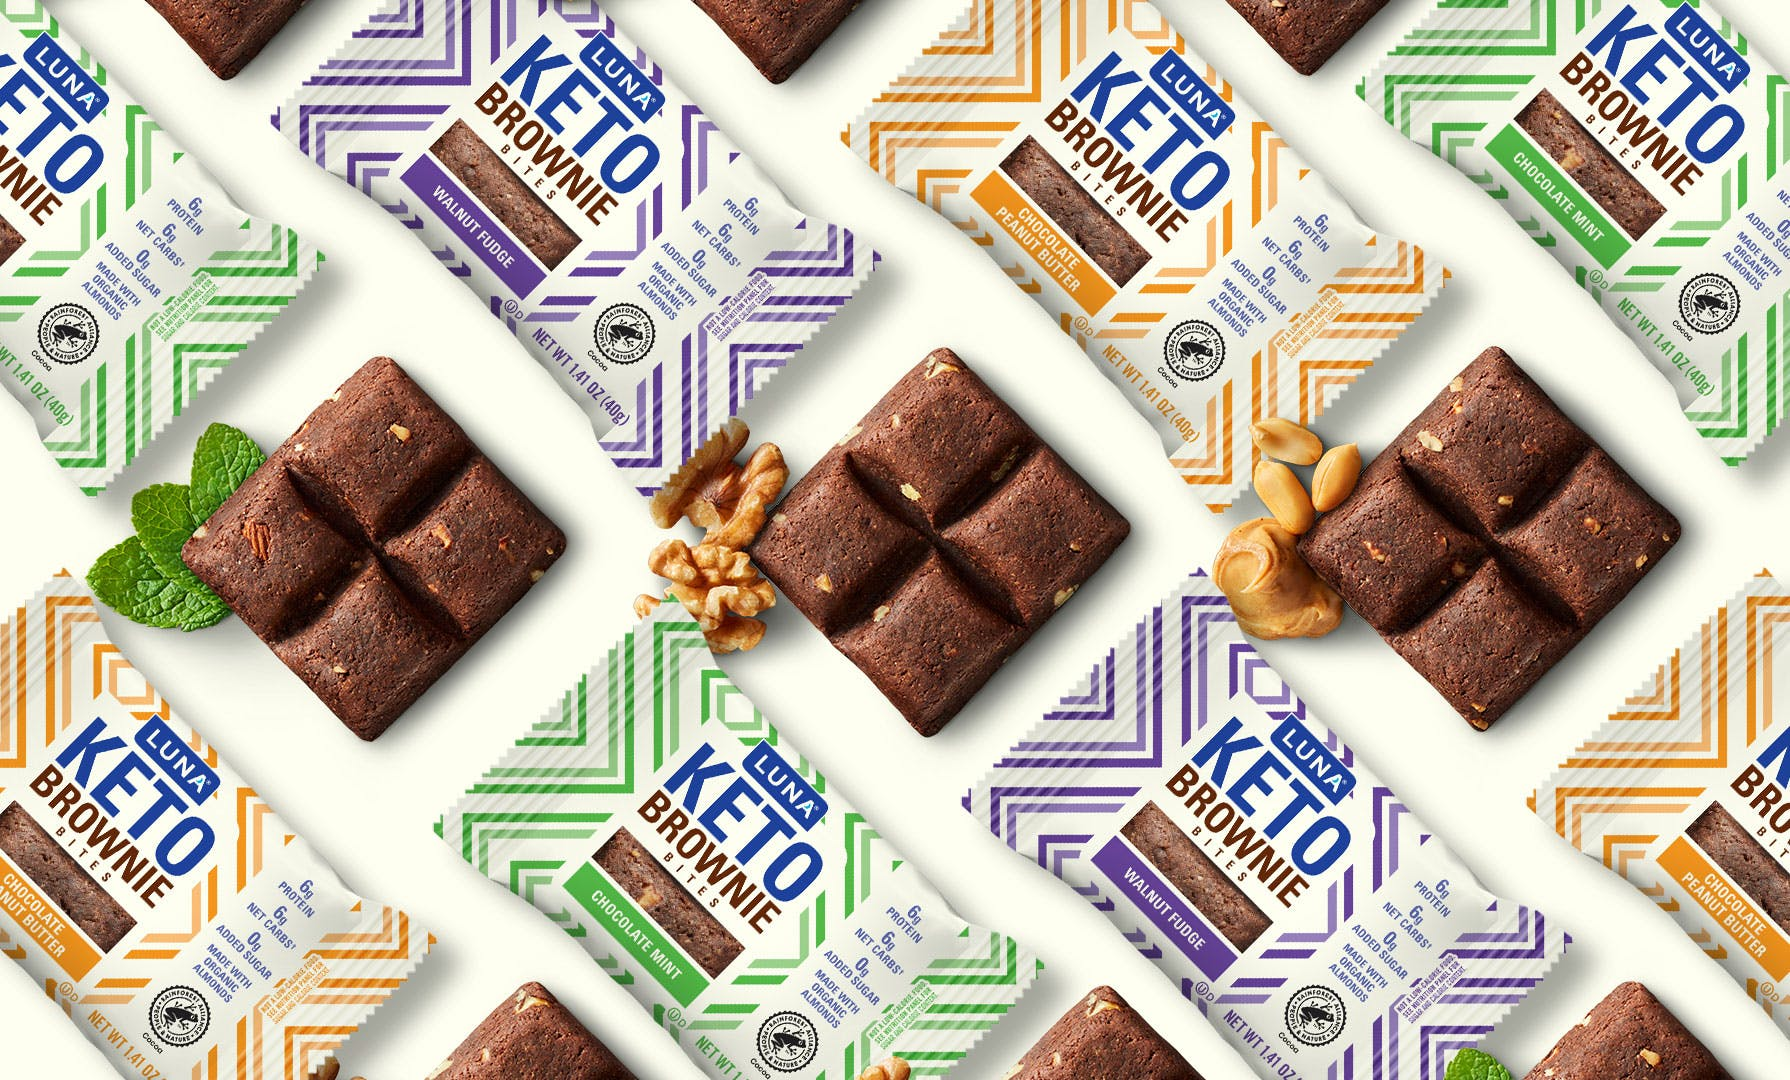 LUNA Keto Brownie Bites Flavors